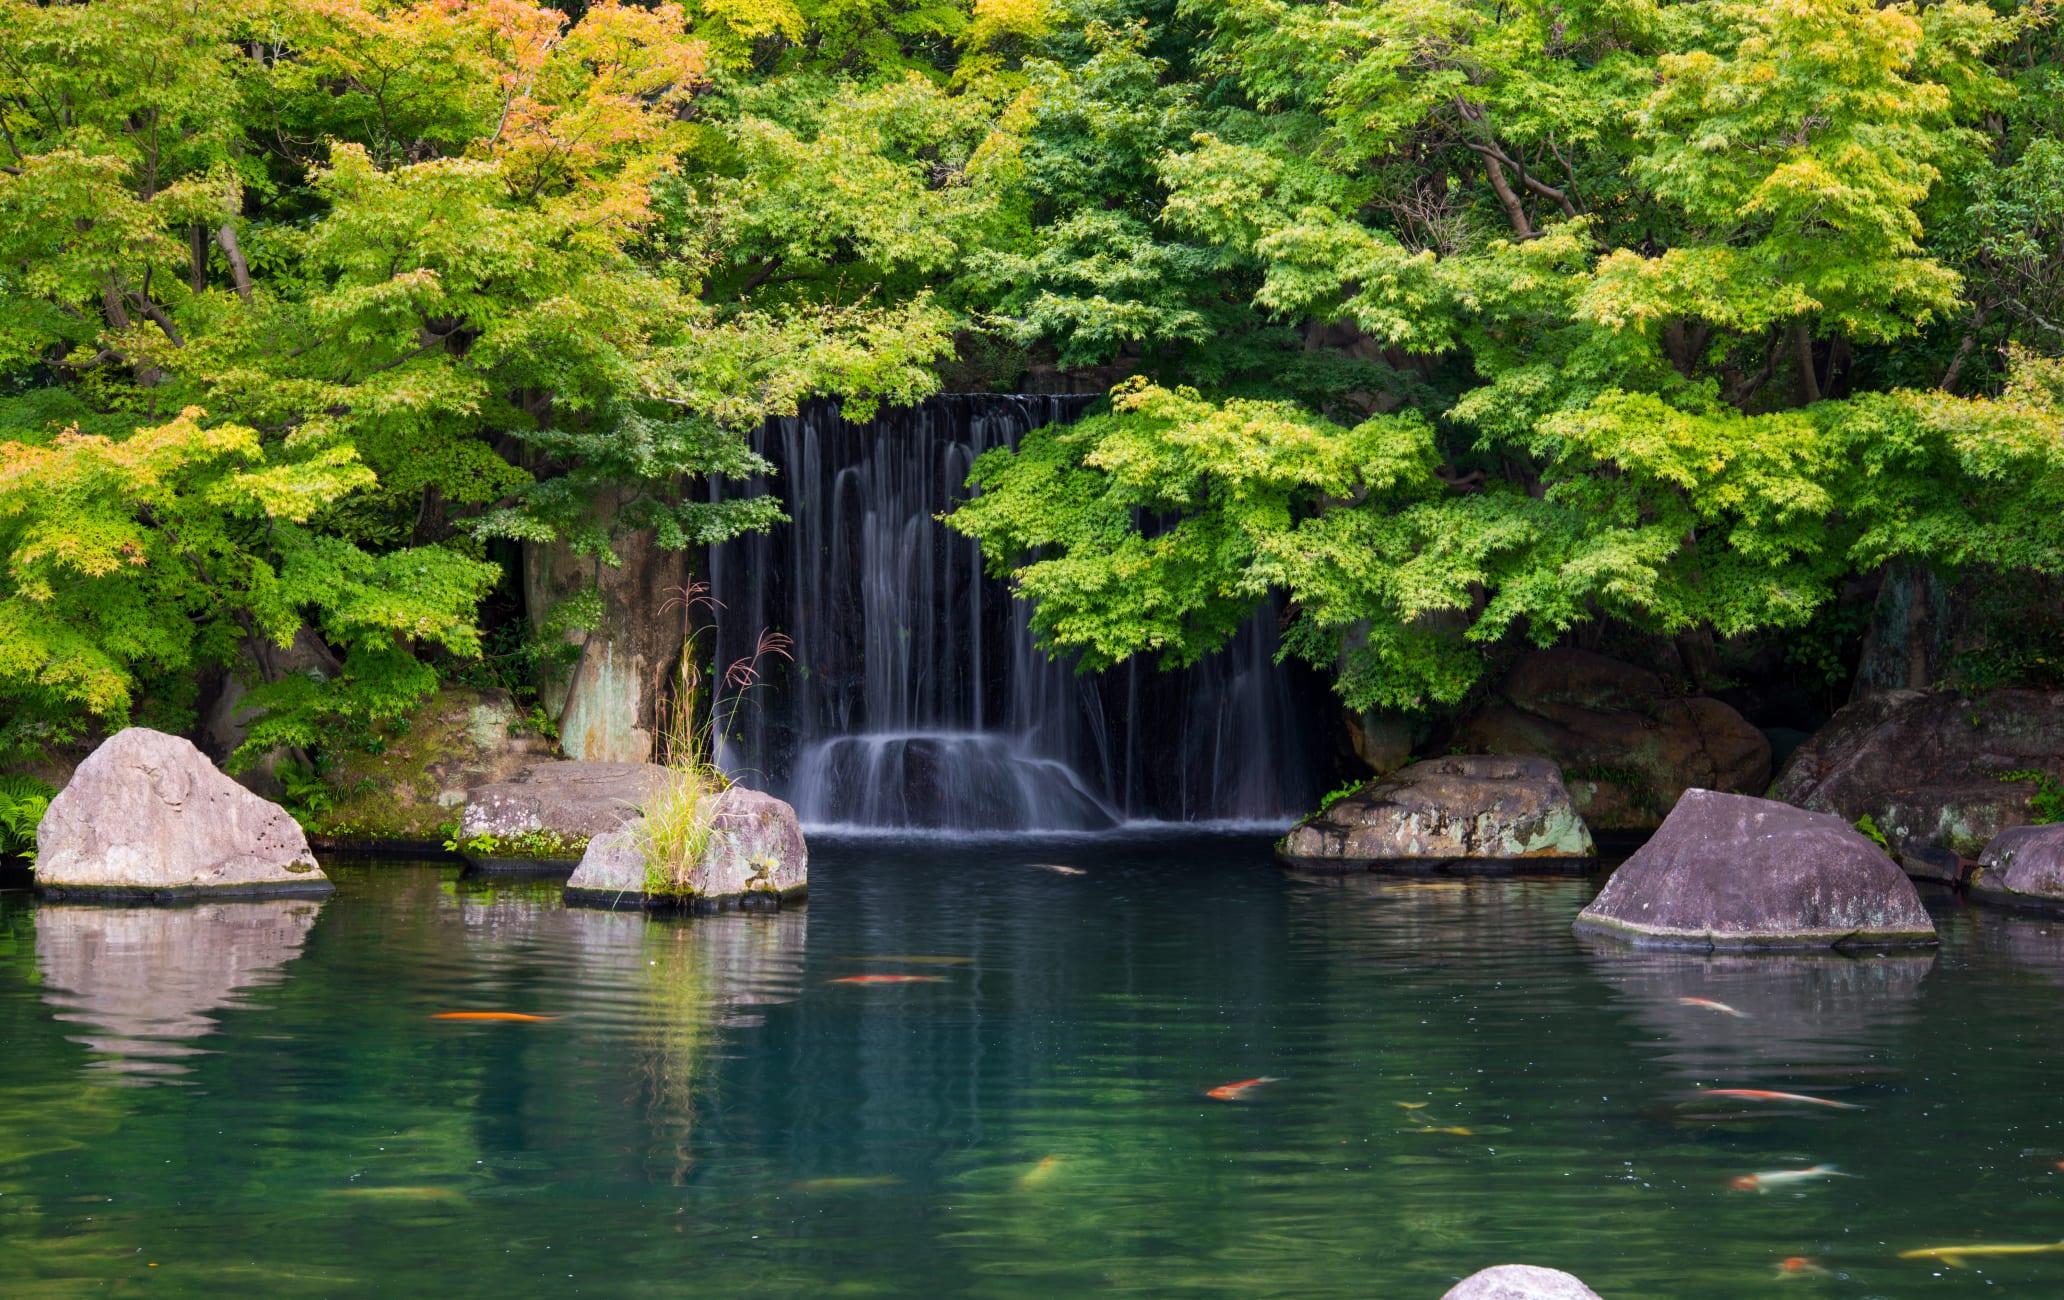 Himeji Castle Nishioyashiki-ato Garden Koko-en